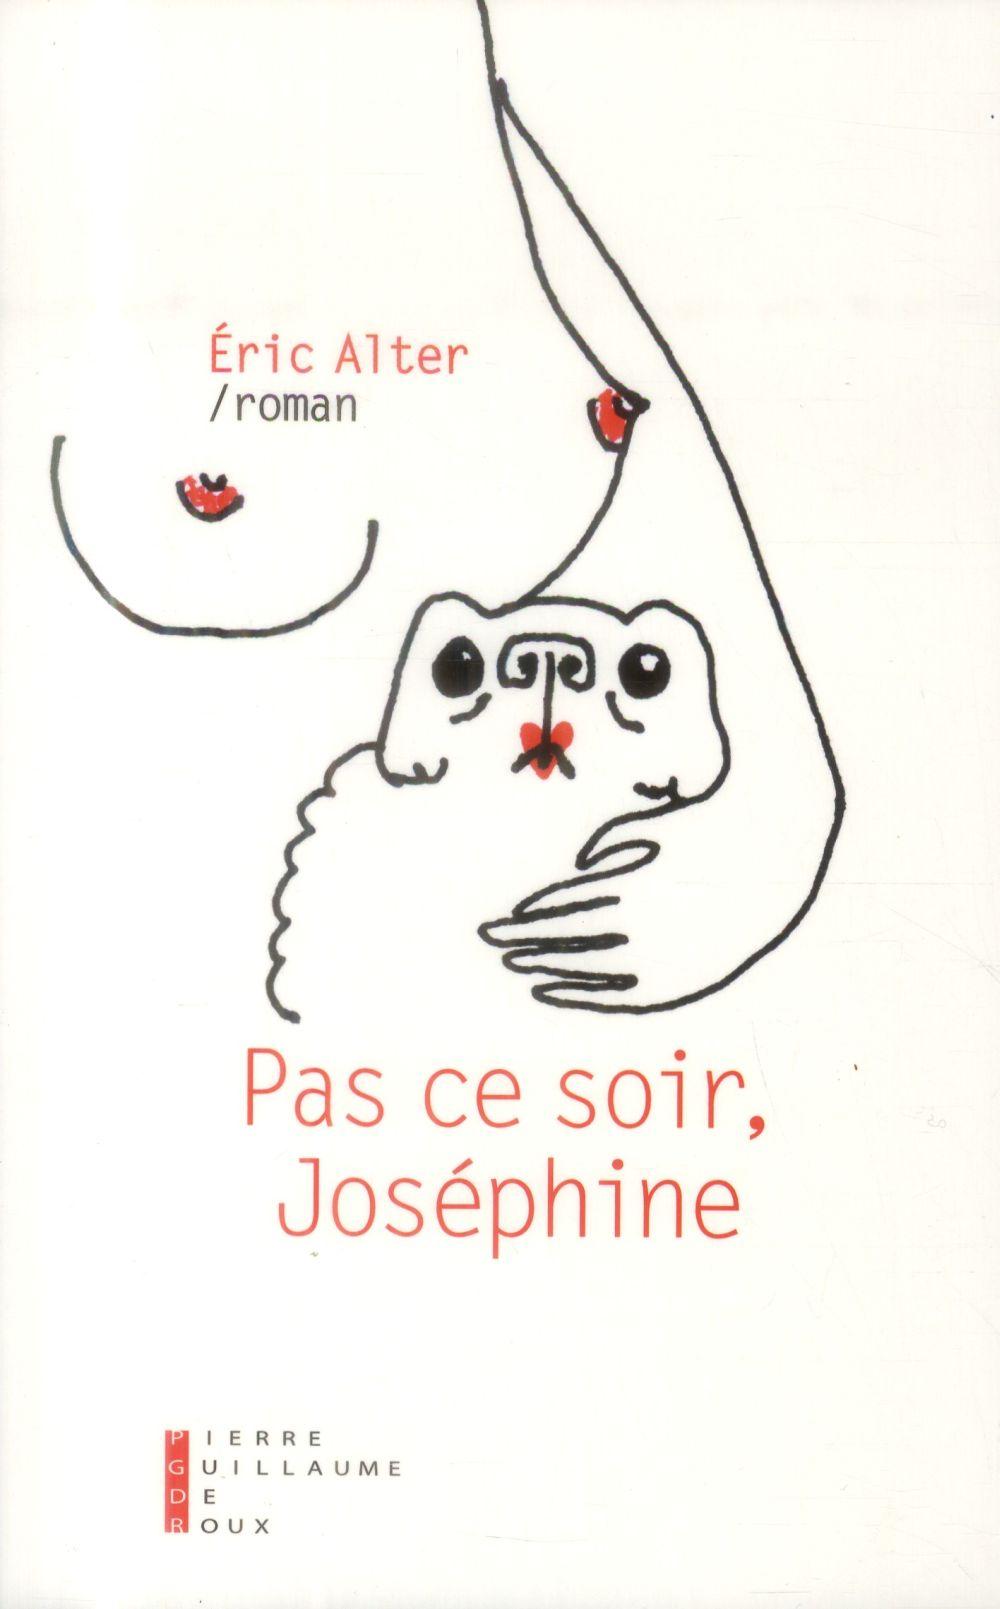 Pas ce soir, Joséphine